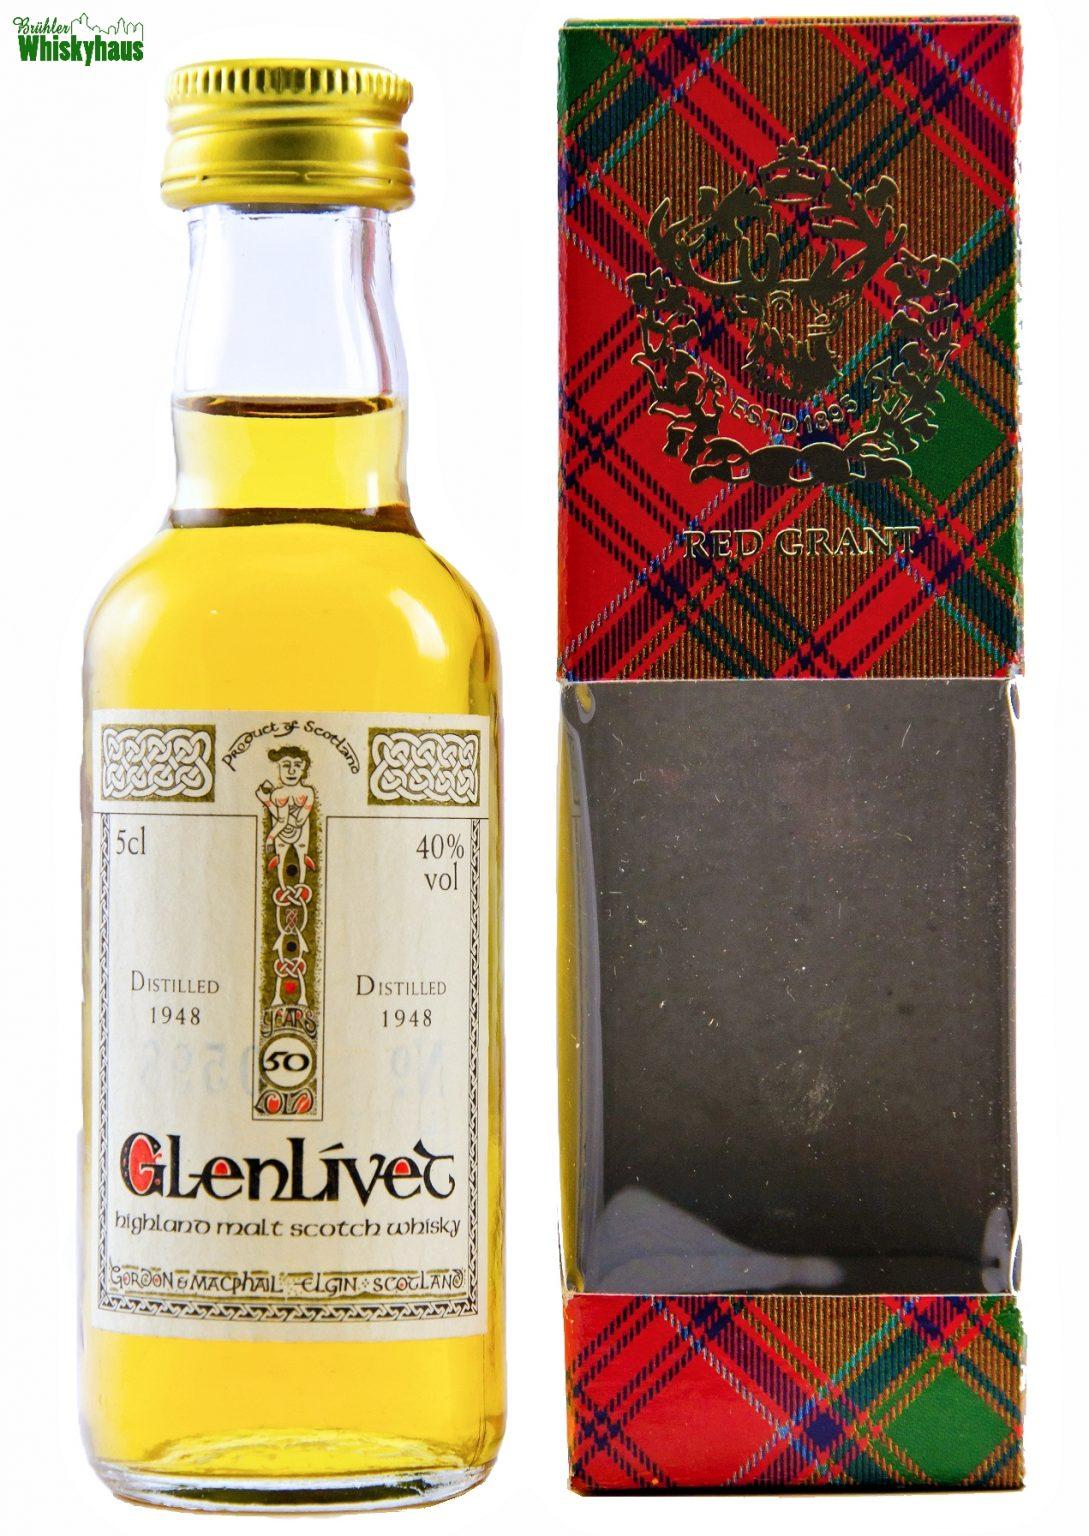 Miniatur Glenlivet Vintage 1948 - 50 Jahre - Book of Kells Serie by Gordon & MacPhail - Single Malt Scotch Whisky